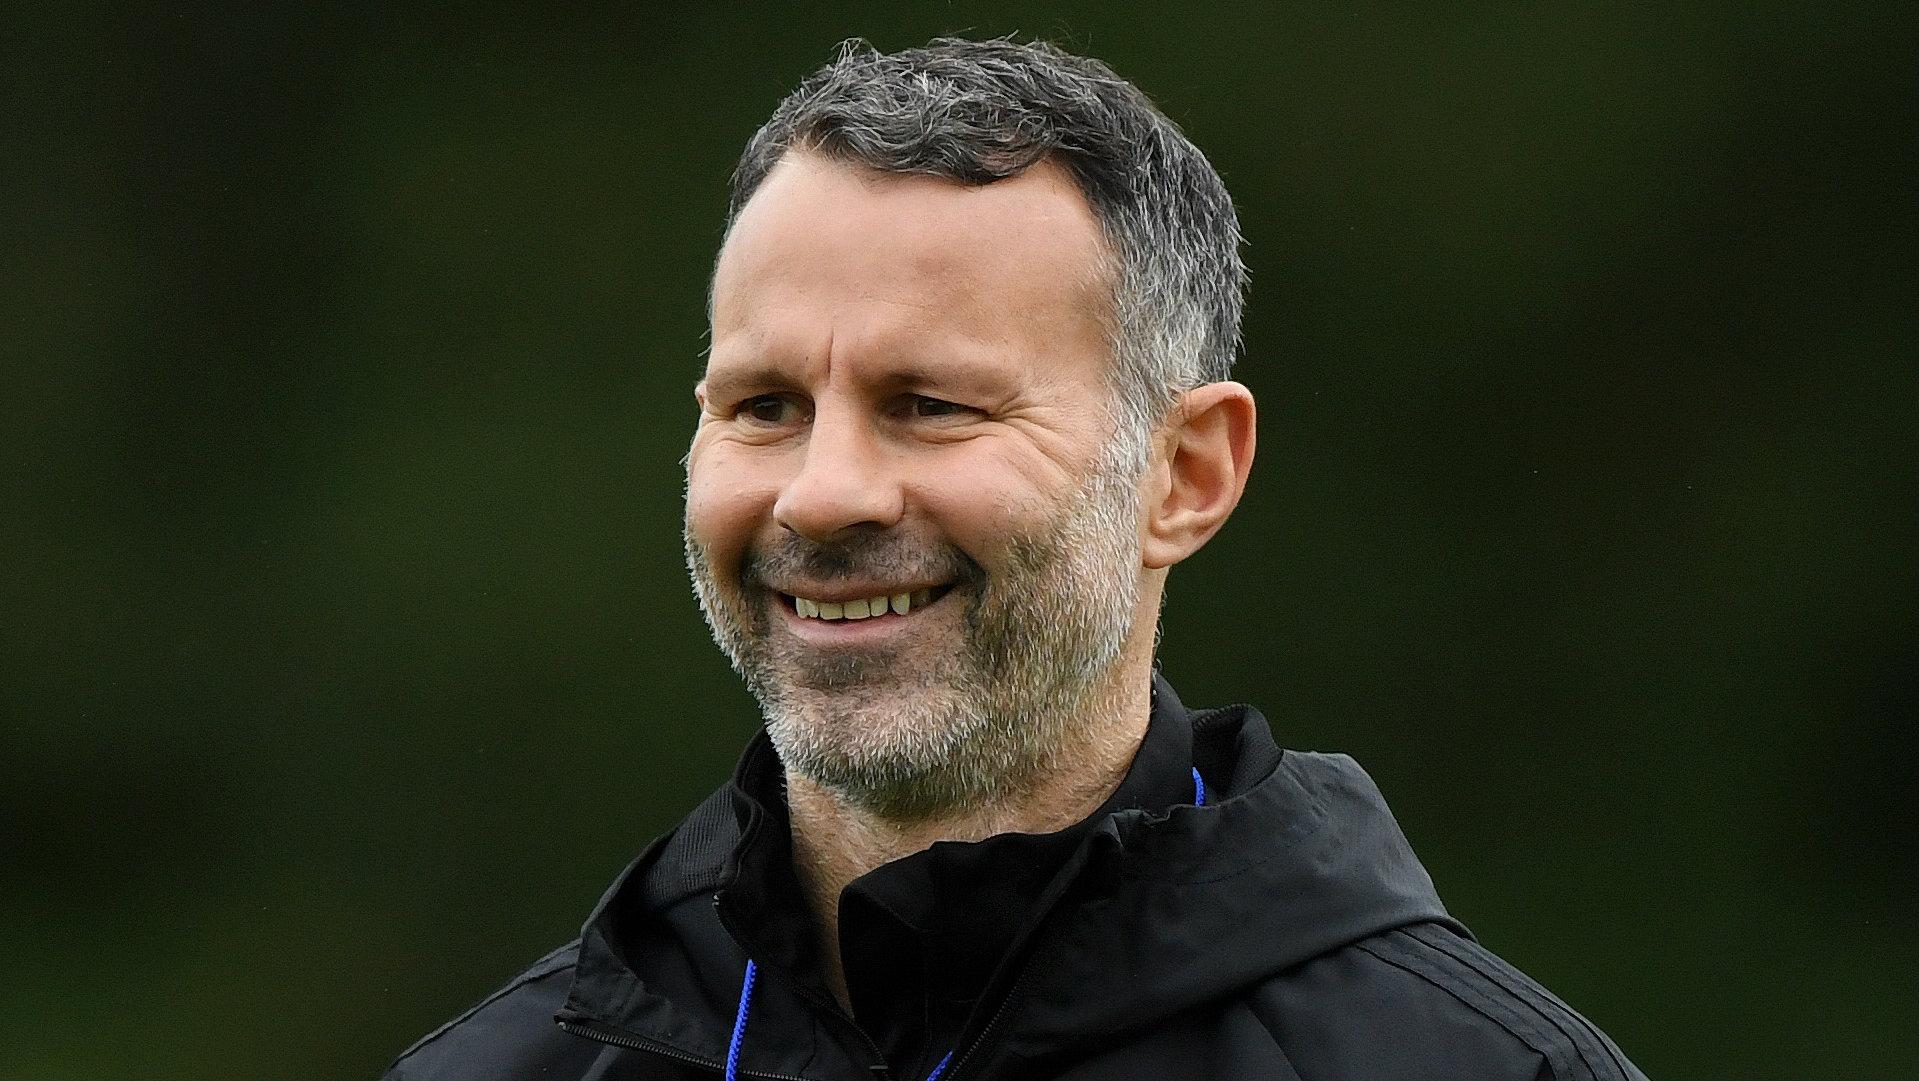 Ryan Giggs Wales coach 2018-19